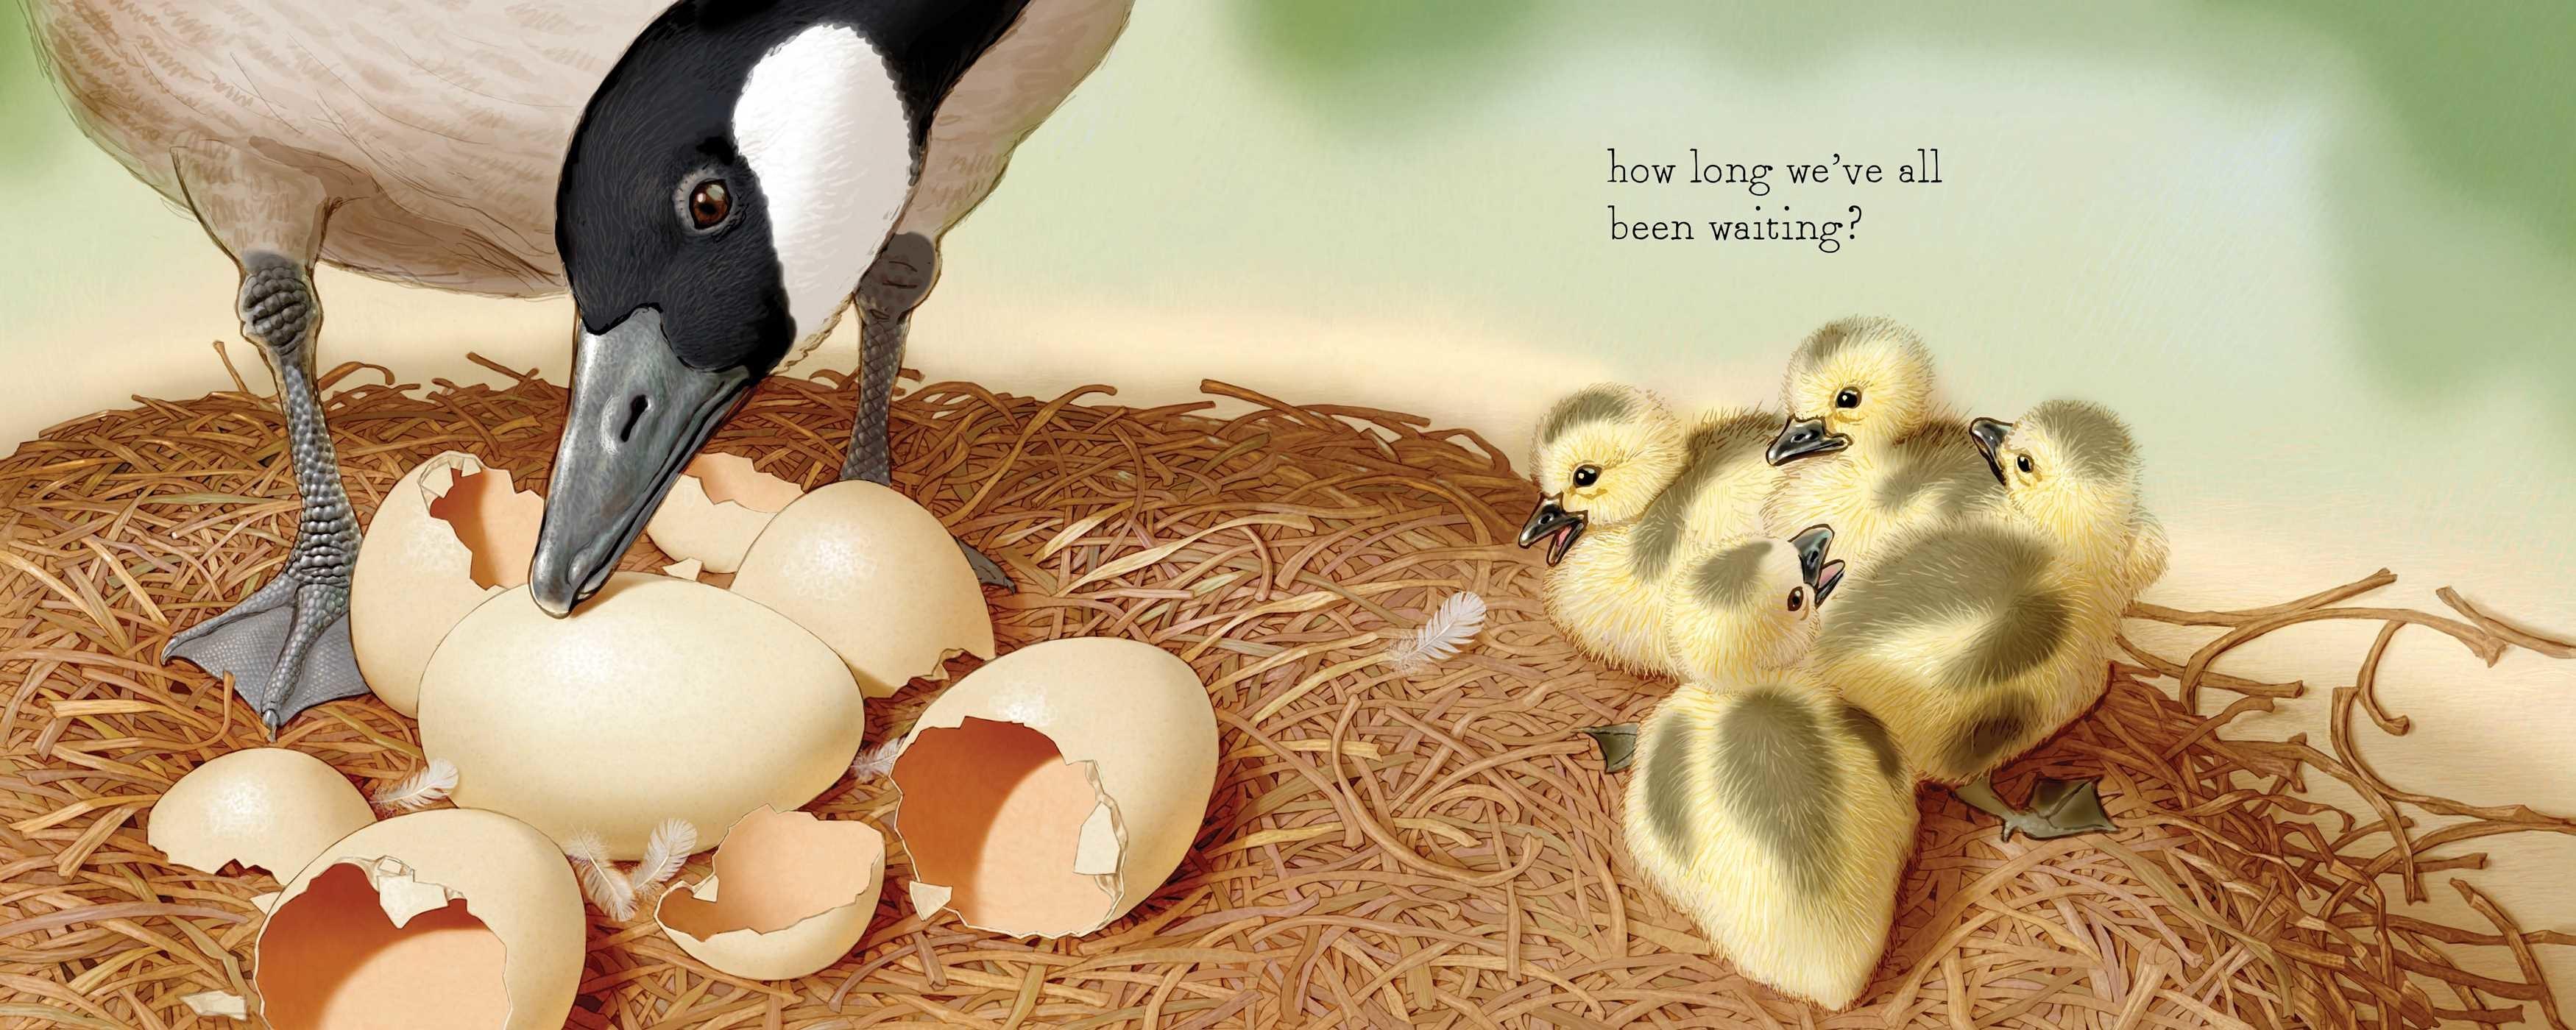 Shake a leg egg 9781481458481.in02